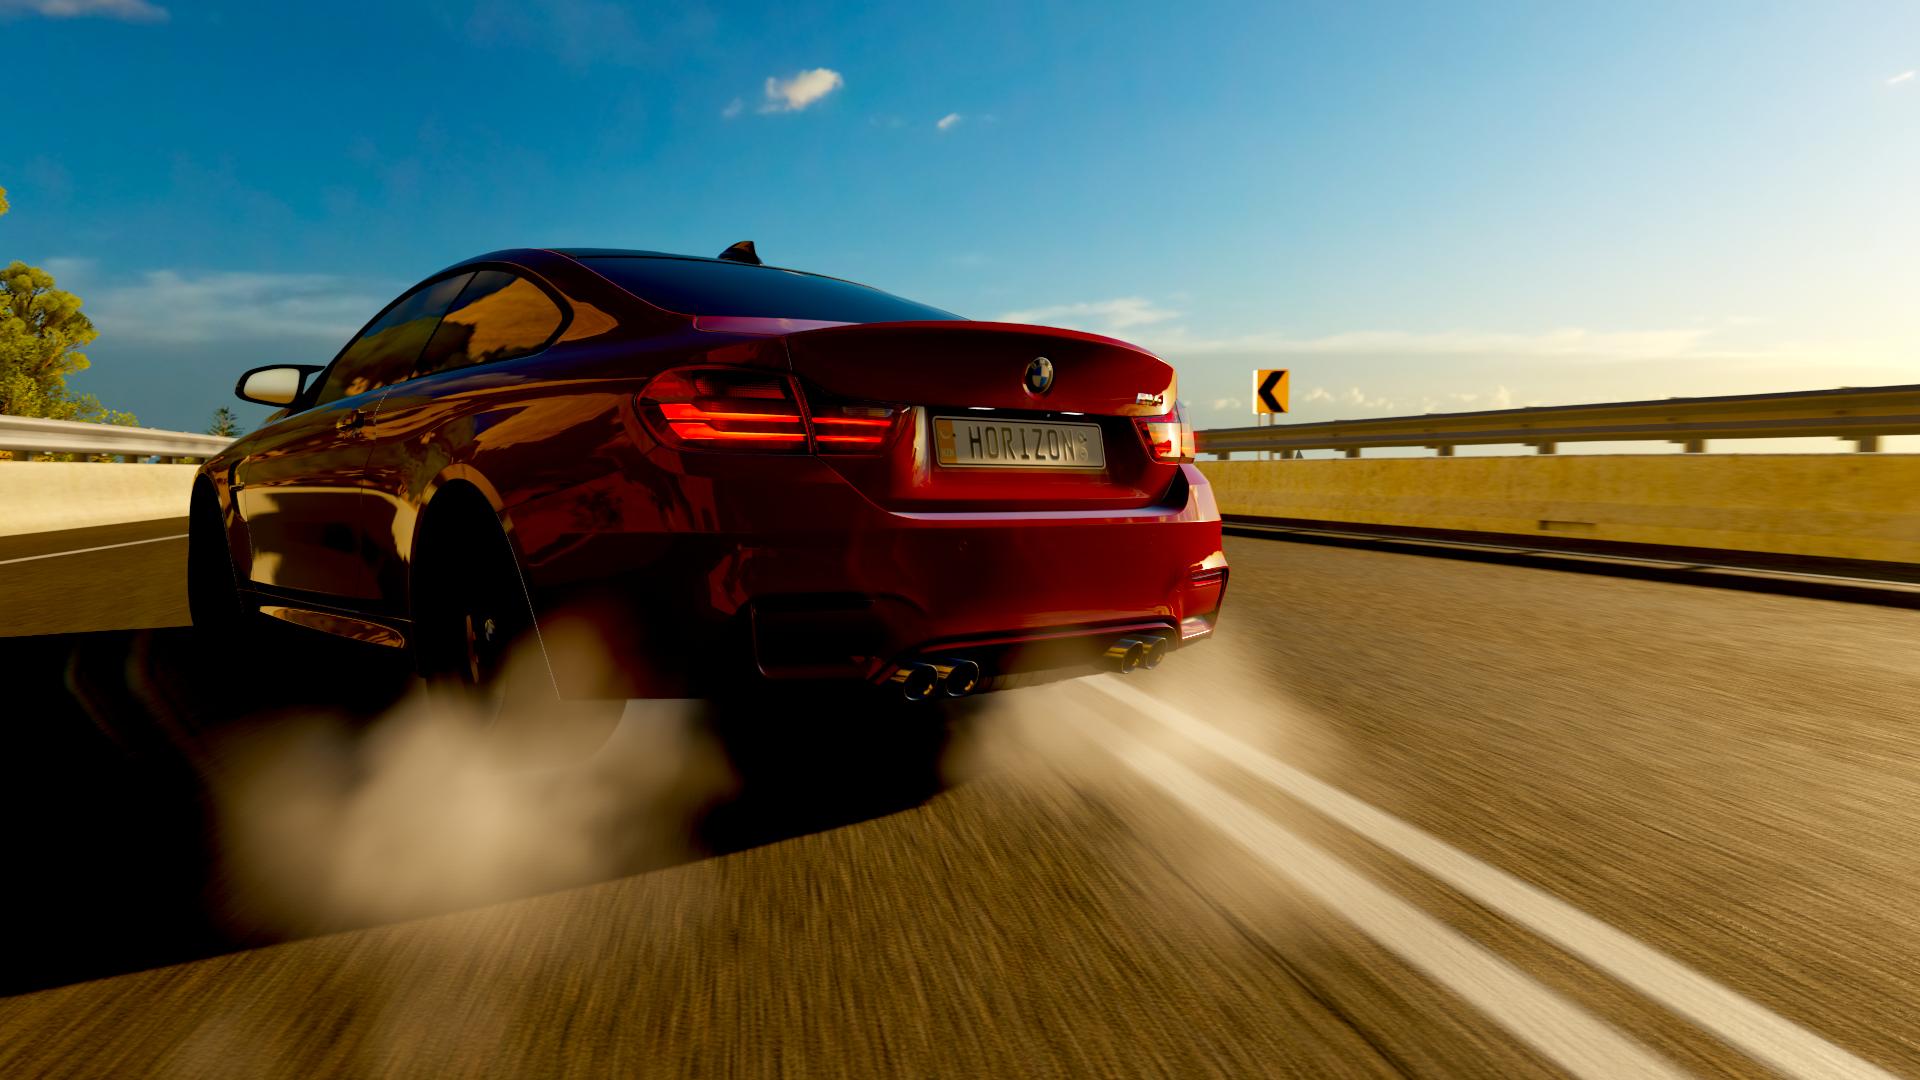 Masaustu Forza Horizon Forza Ufuk 3 Pc Oyunlari Ekran